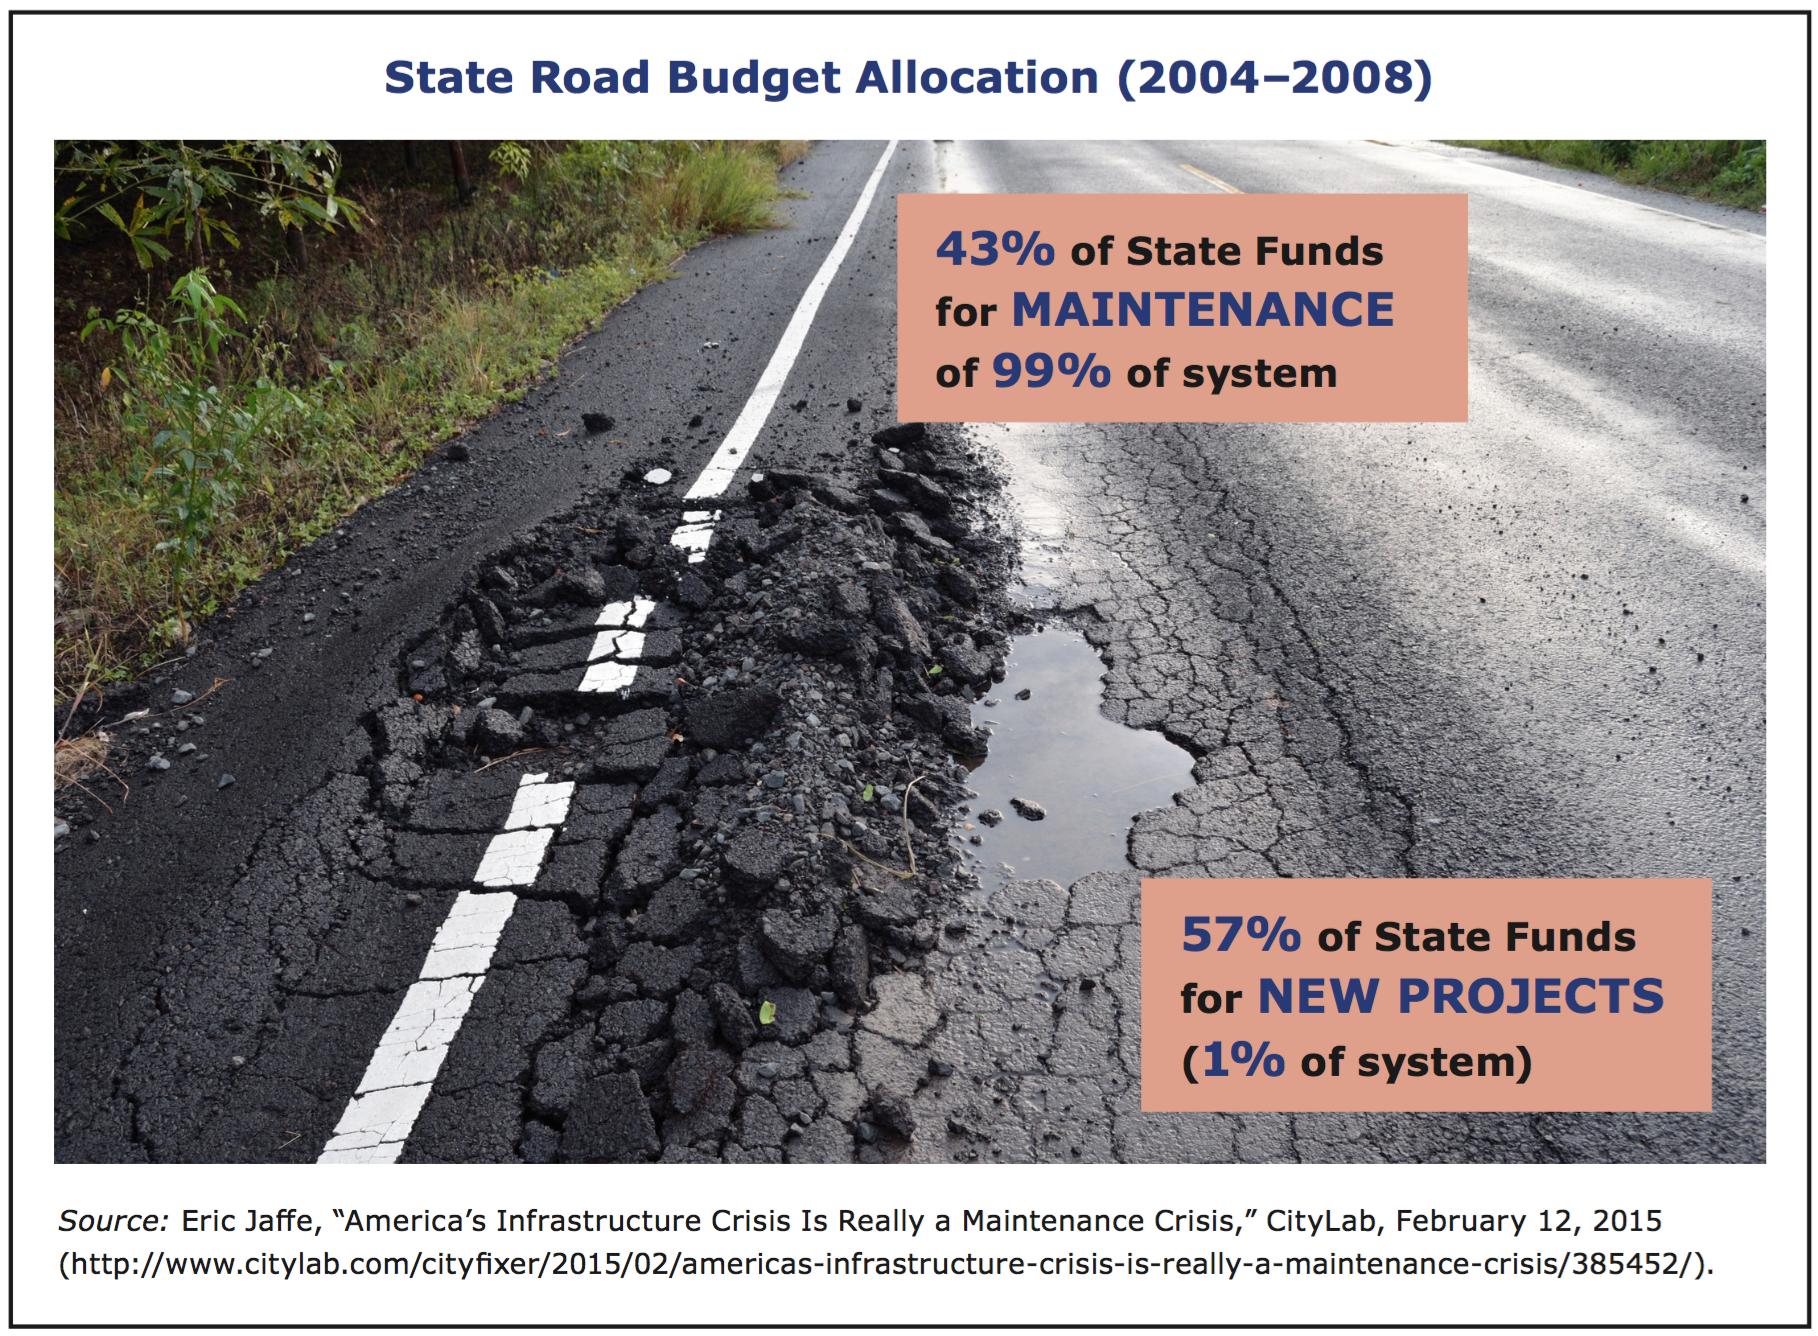 Repair of roads due to unused funds 79